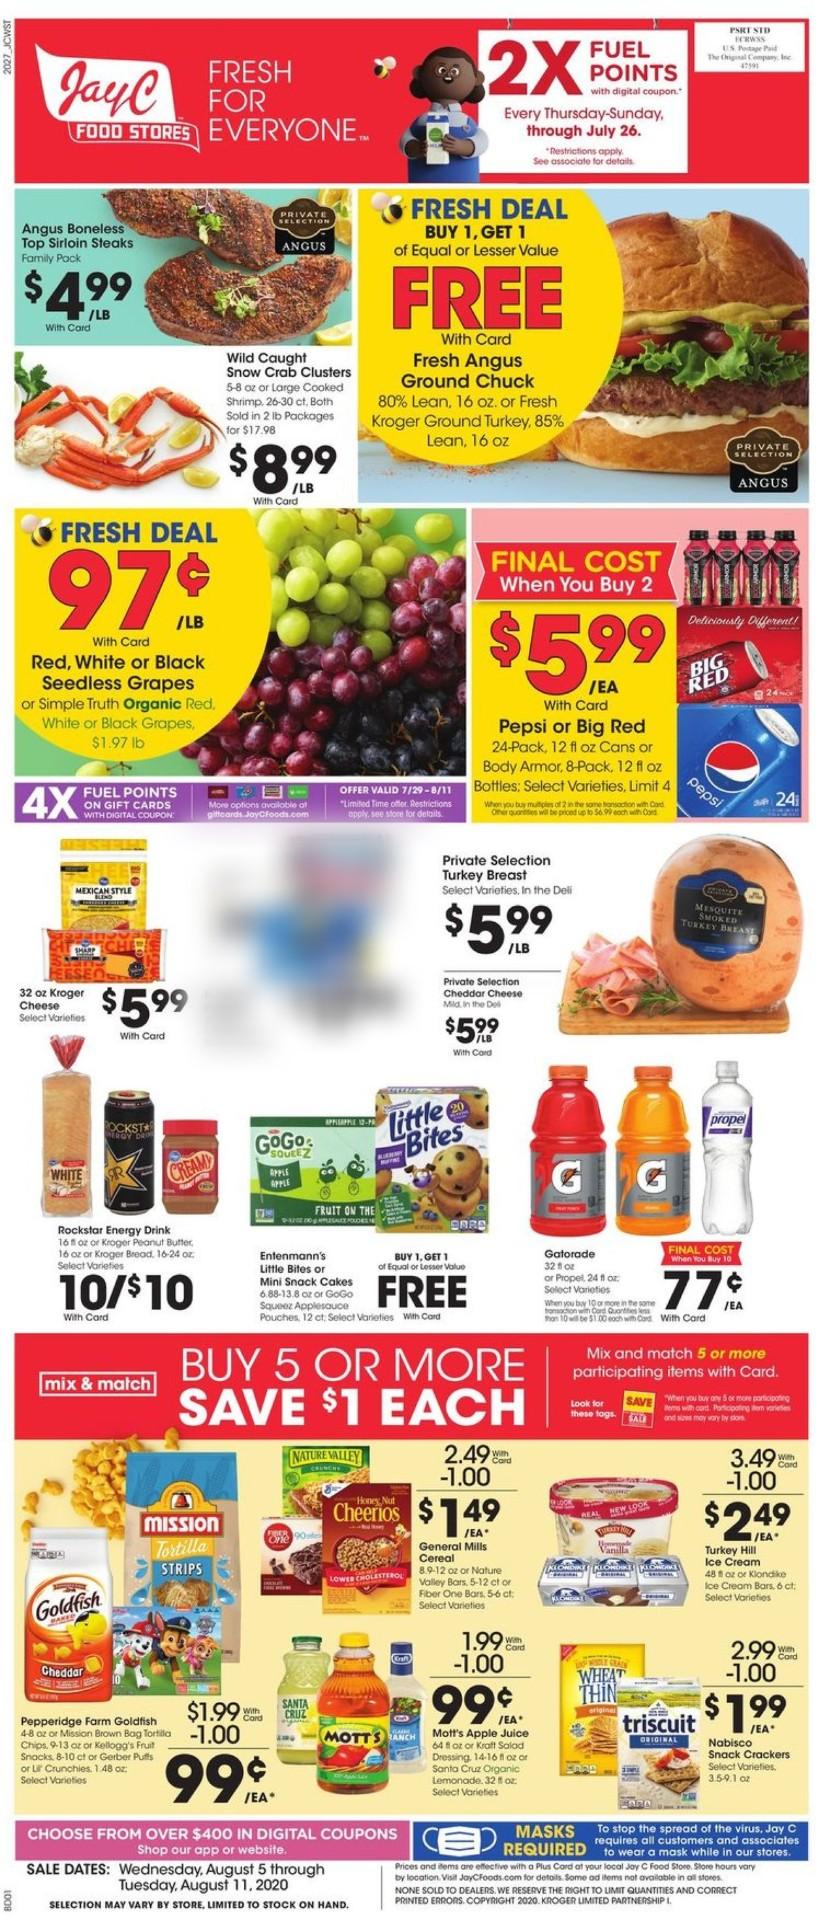 Jay C Food Stores Weekly Ad Circular - valid 08/05-08/11/2020